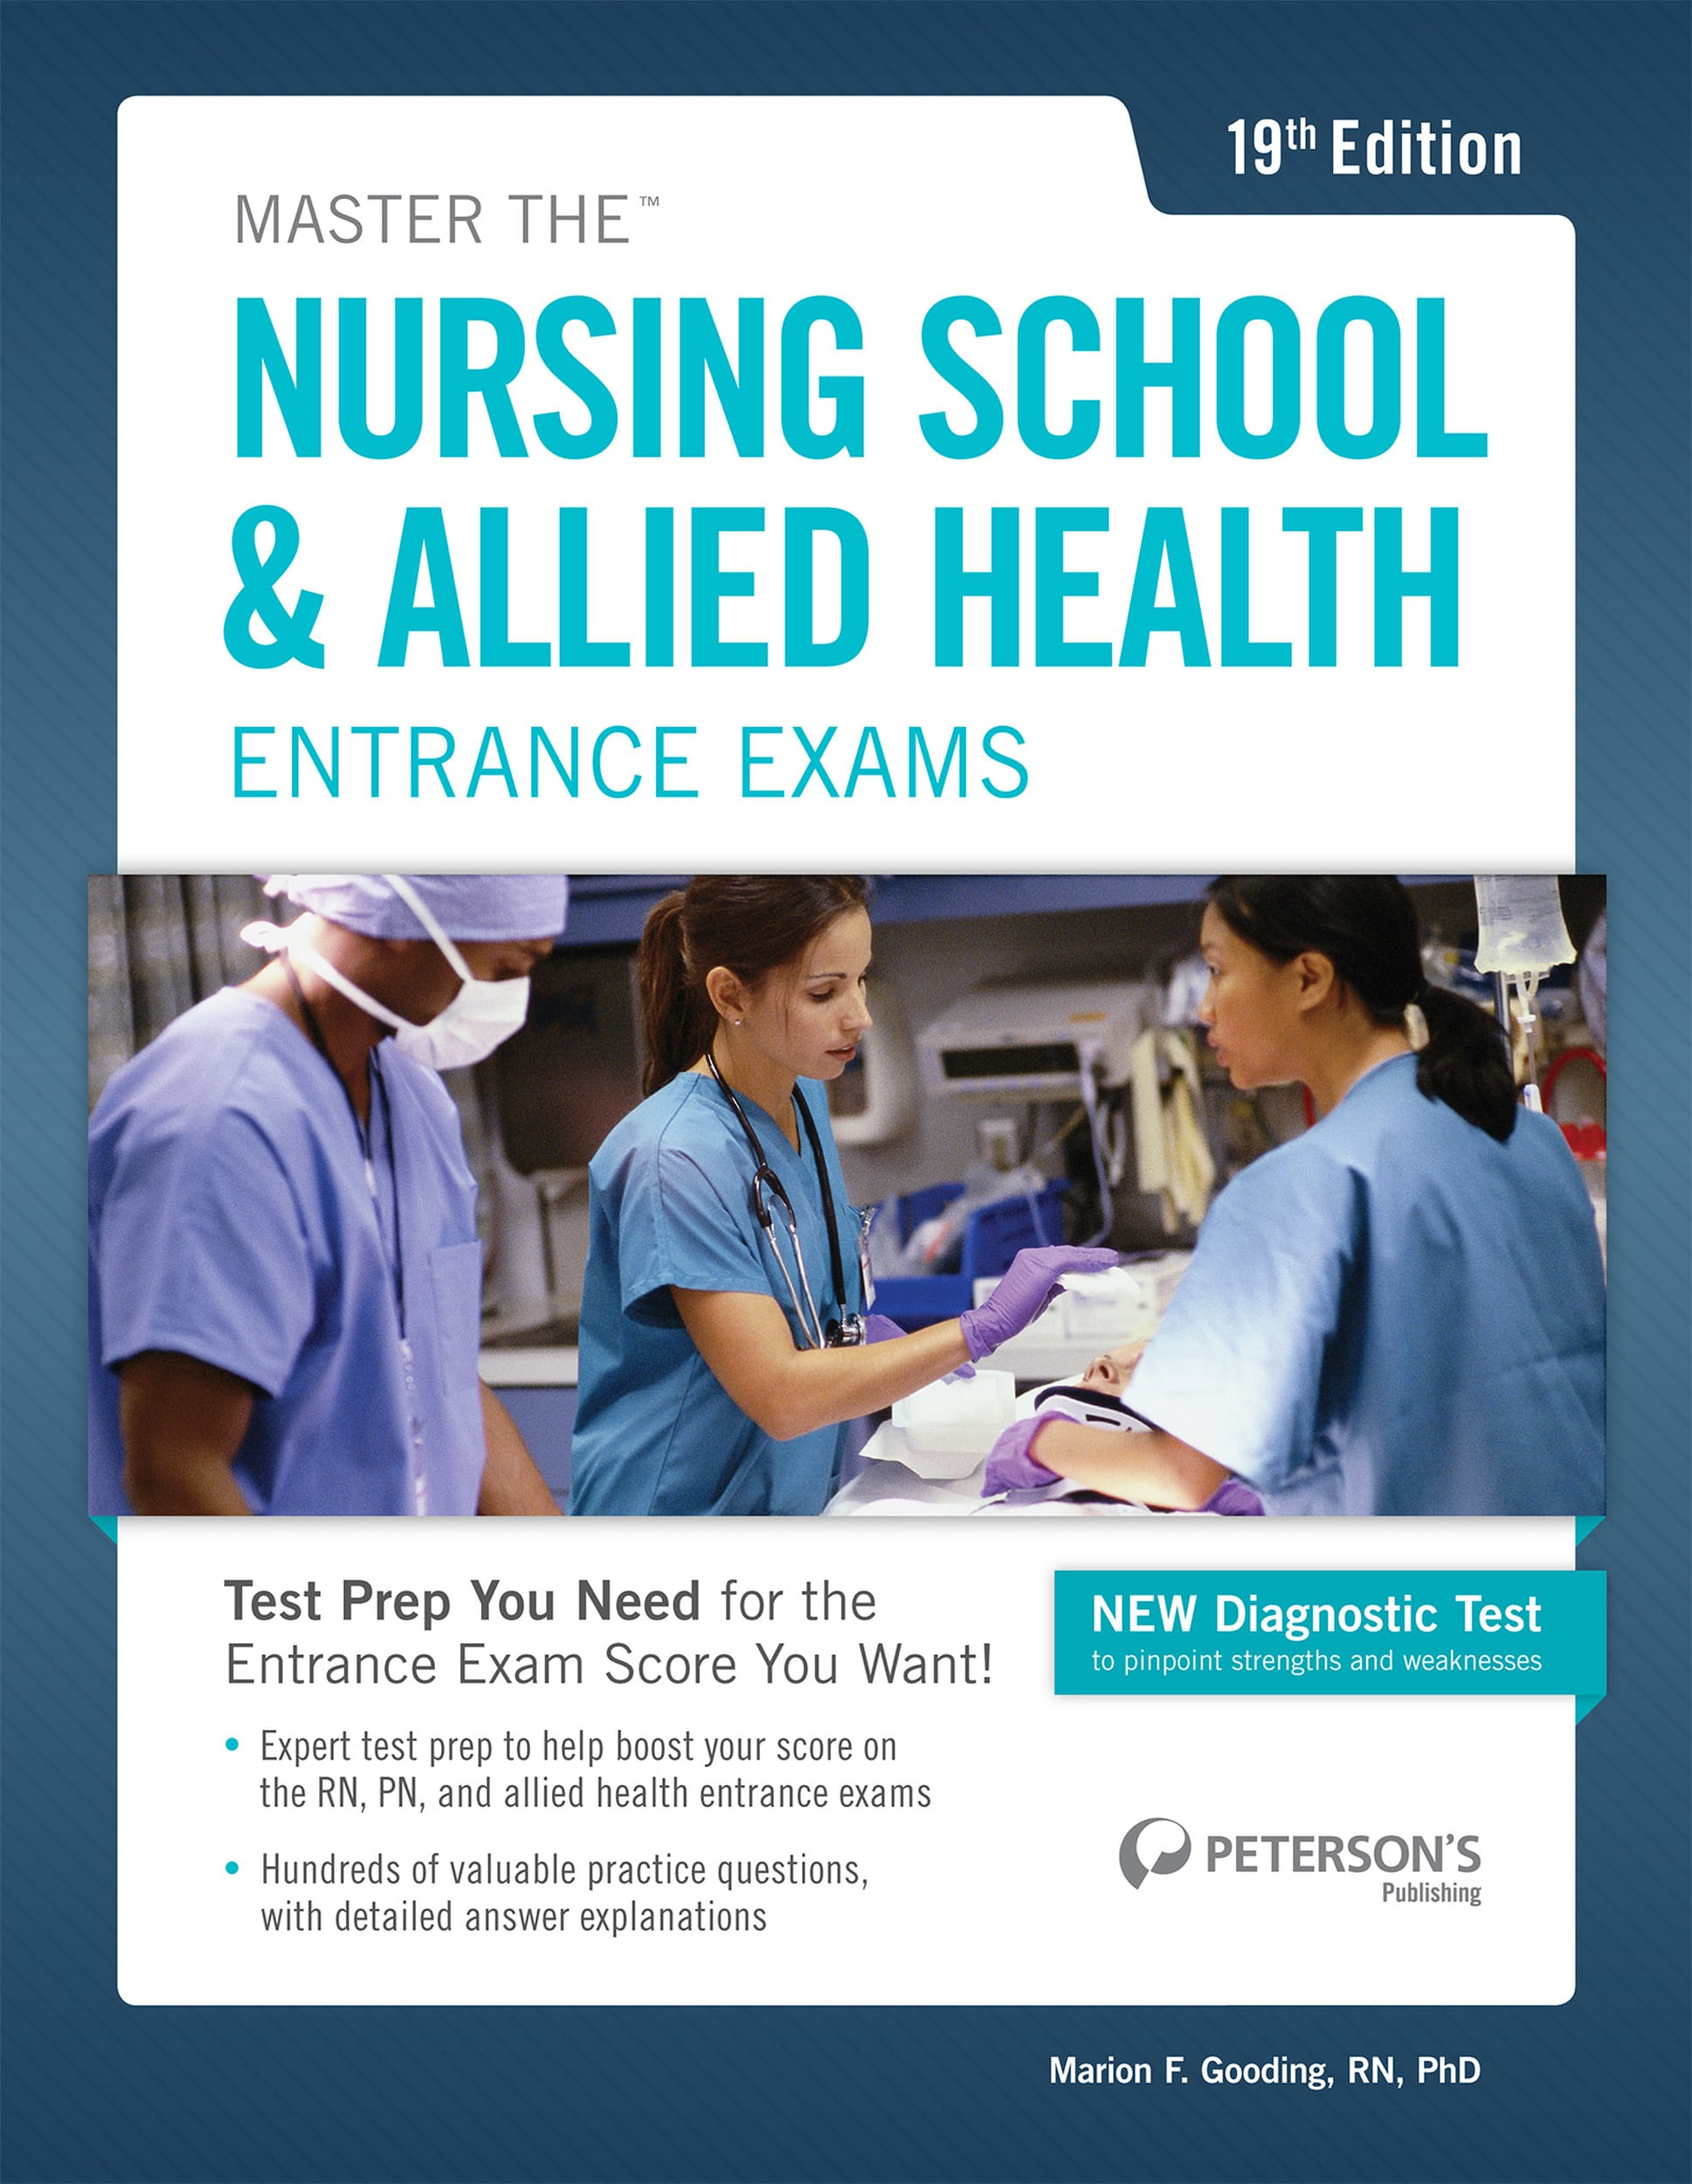 Master the™ Nursing School & Allied Health Exams